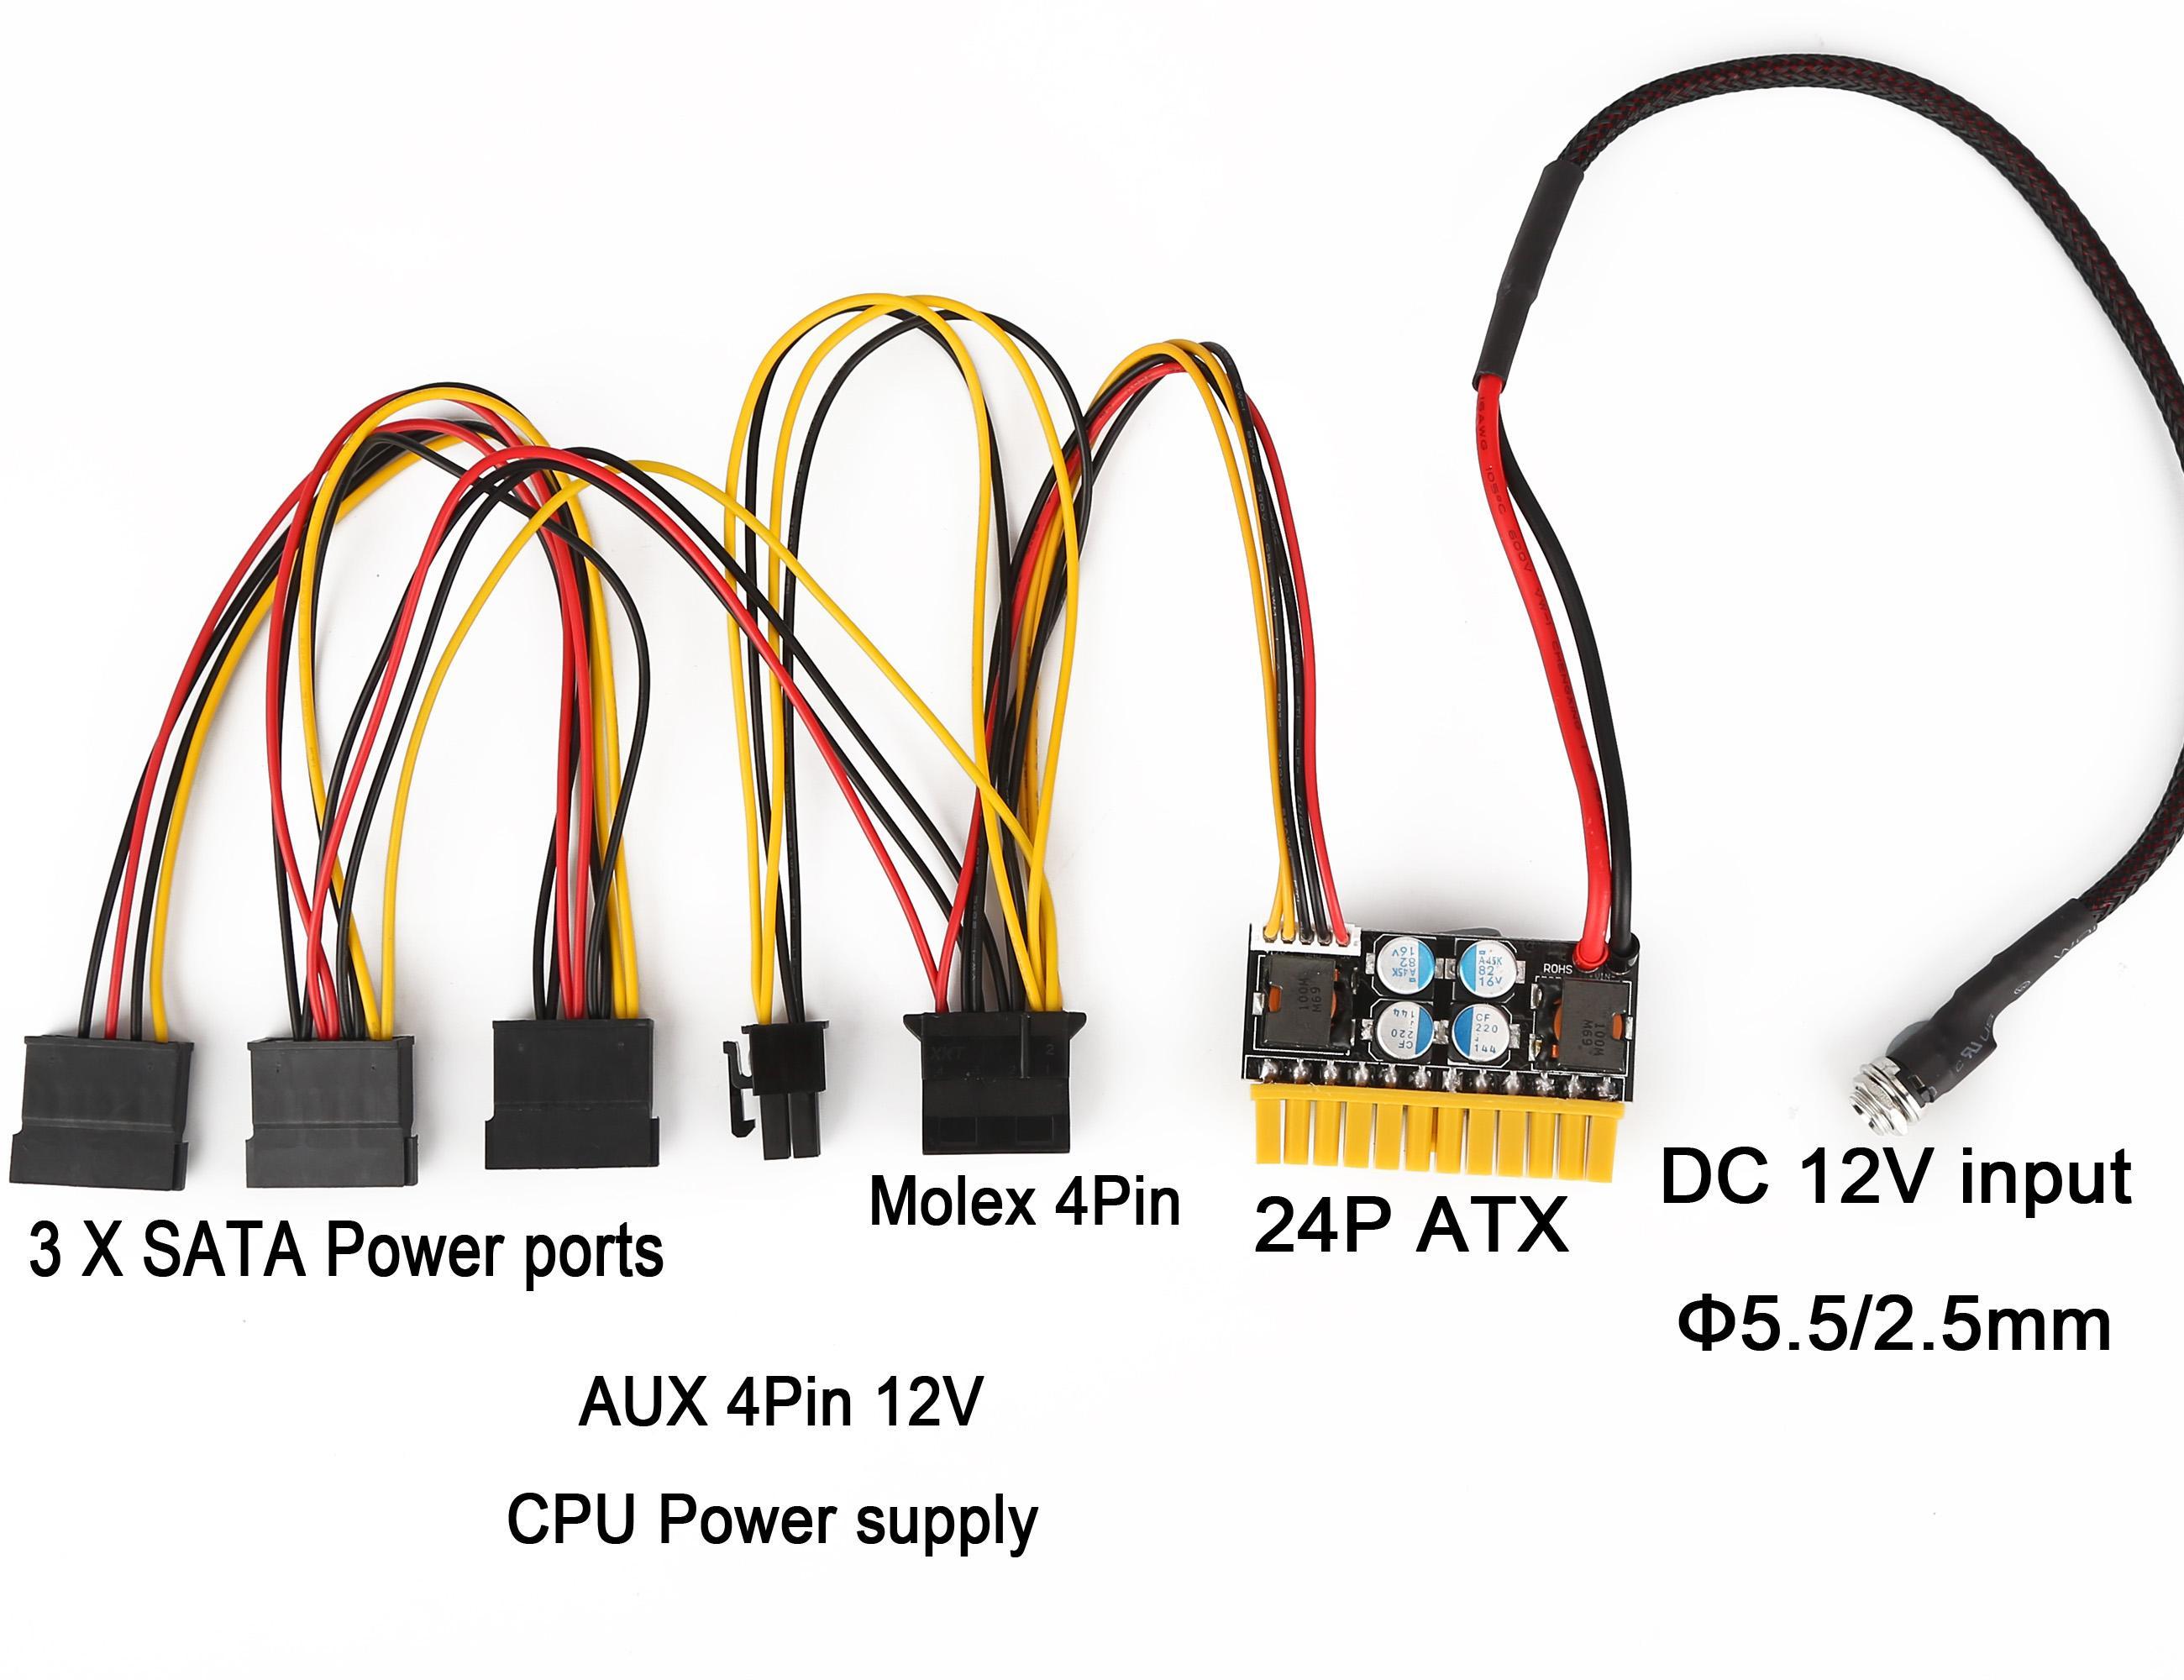 180W 12V DC ITX PC ATX PSU Supplie Mini Car Auto Mirco Pico Atom HTPC 1U Rackmount PC ATX ATX 24 PIN Switch Alimentatore